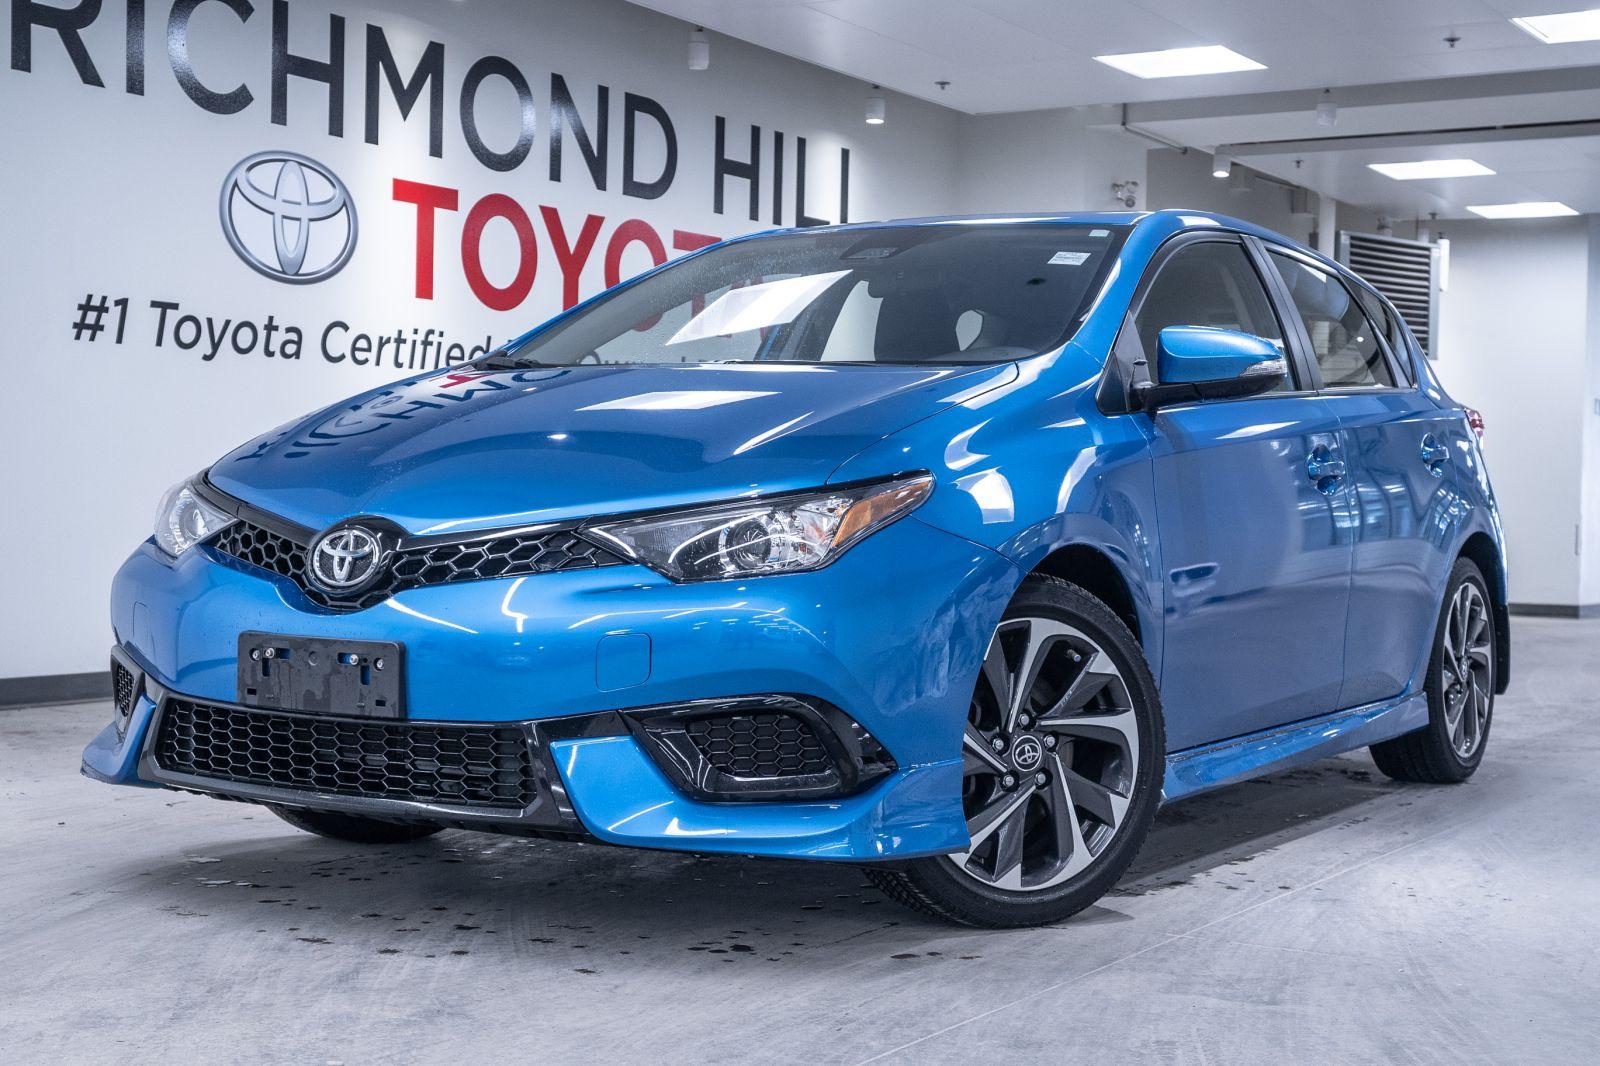 2018 Toyota Corolla iM Image